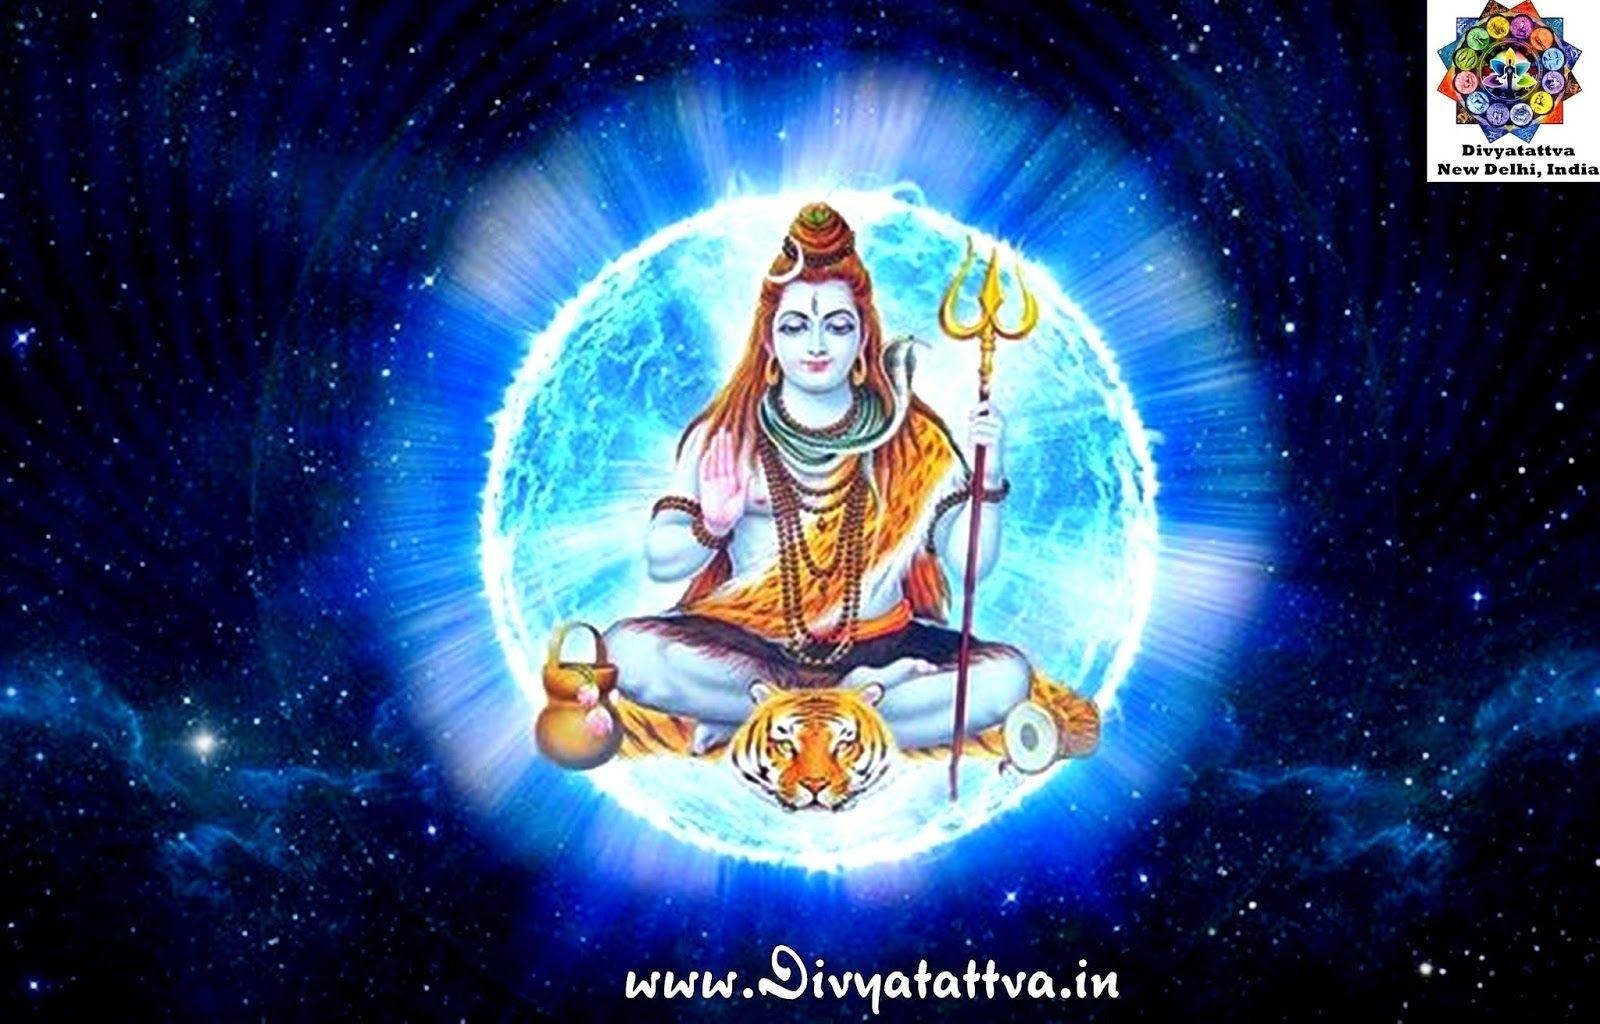 Hindu Gods Wallpaper For Desktop: Lord Shiva 3D Wallpapers